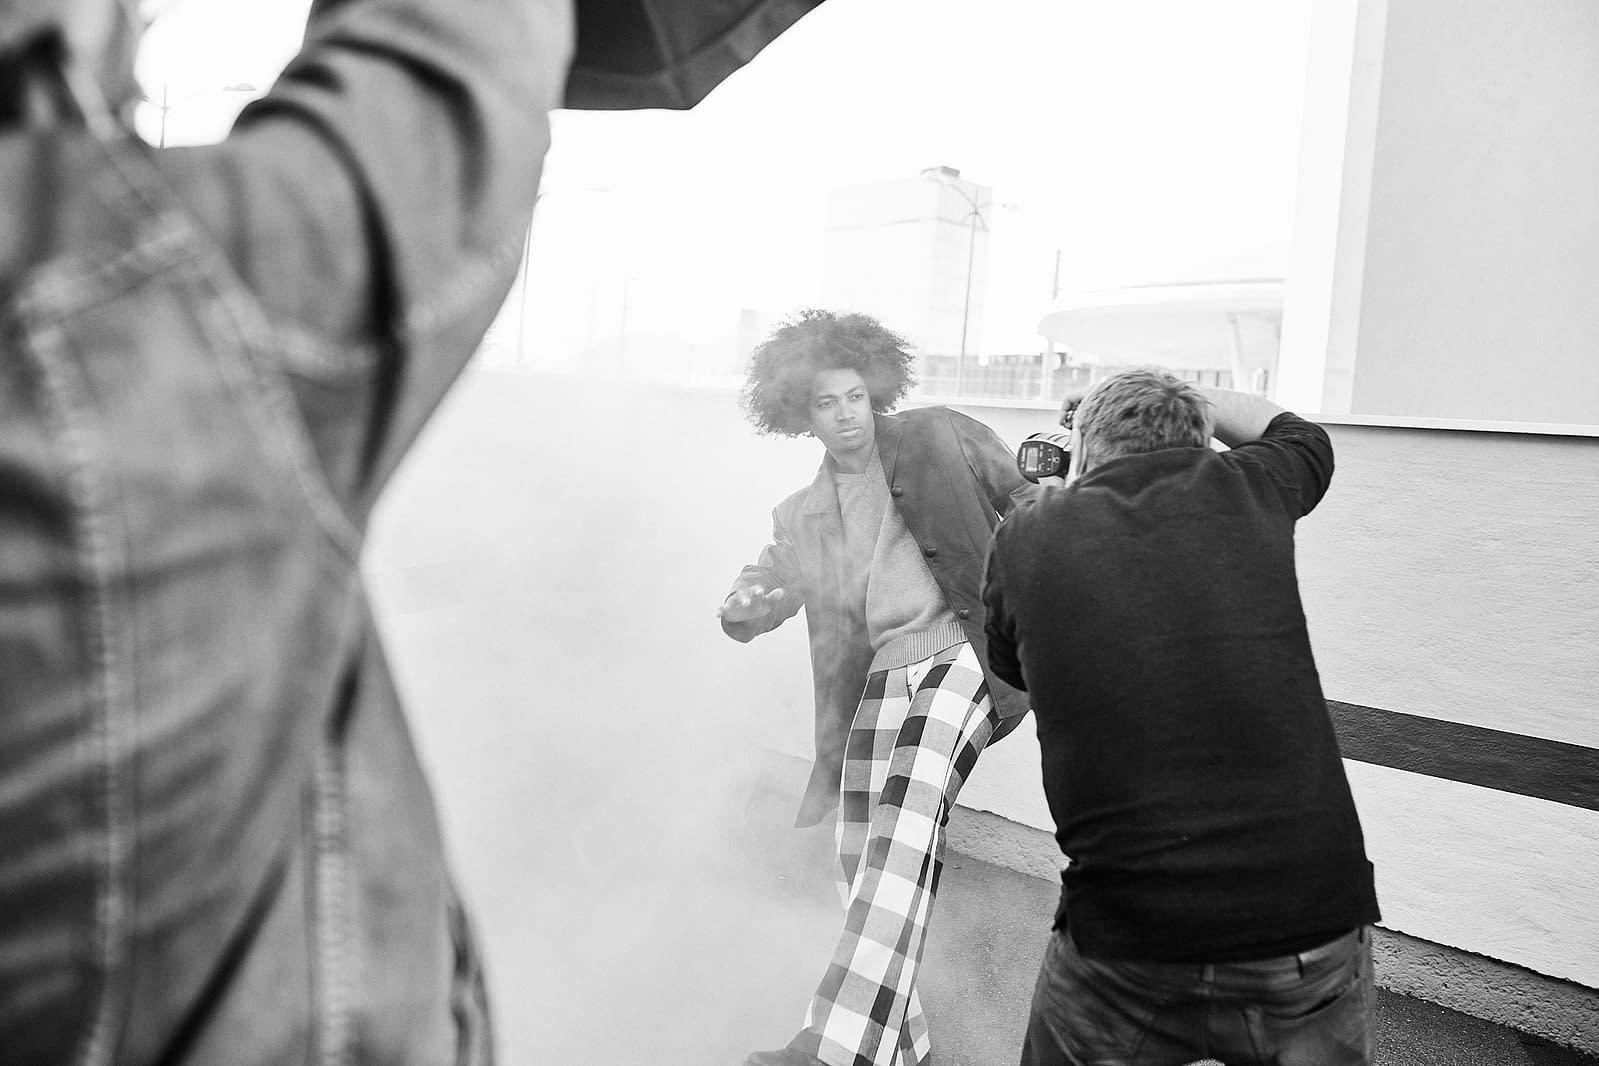 Yosliem – Behind the Scenes